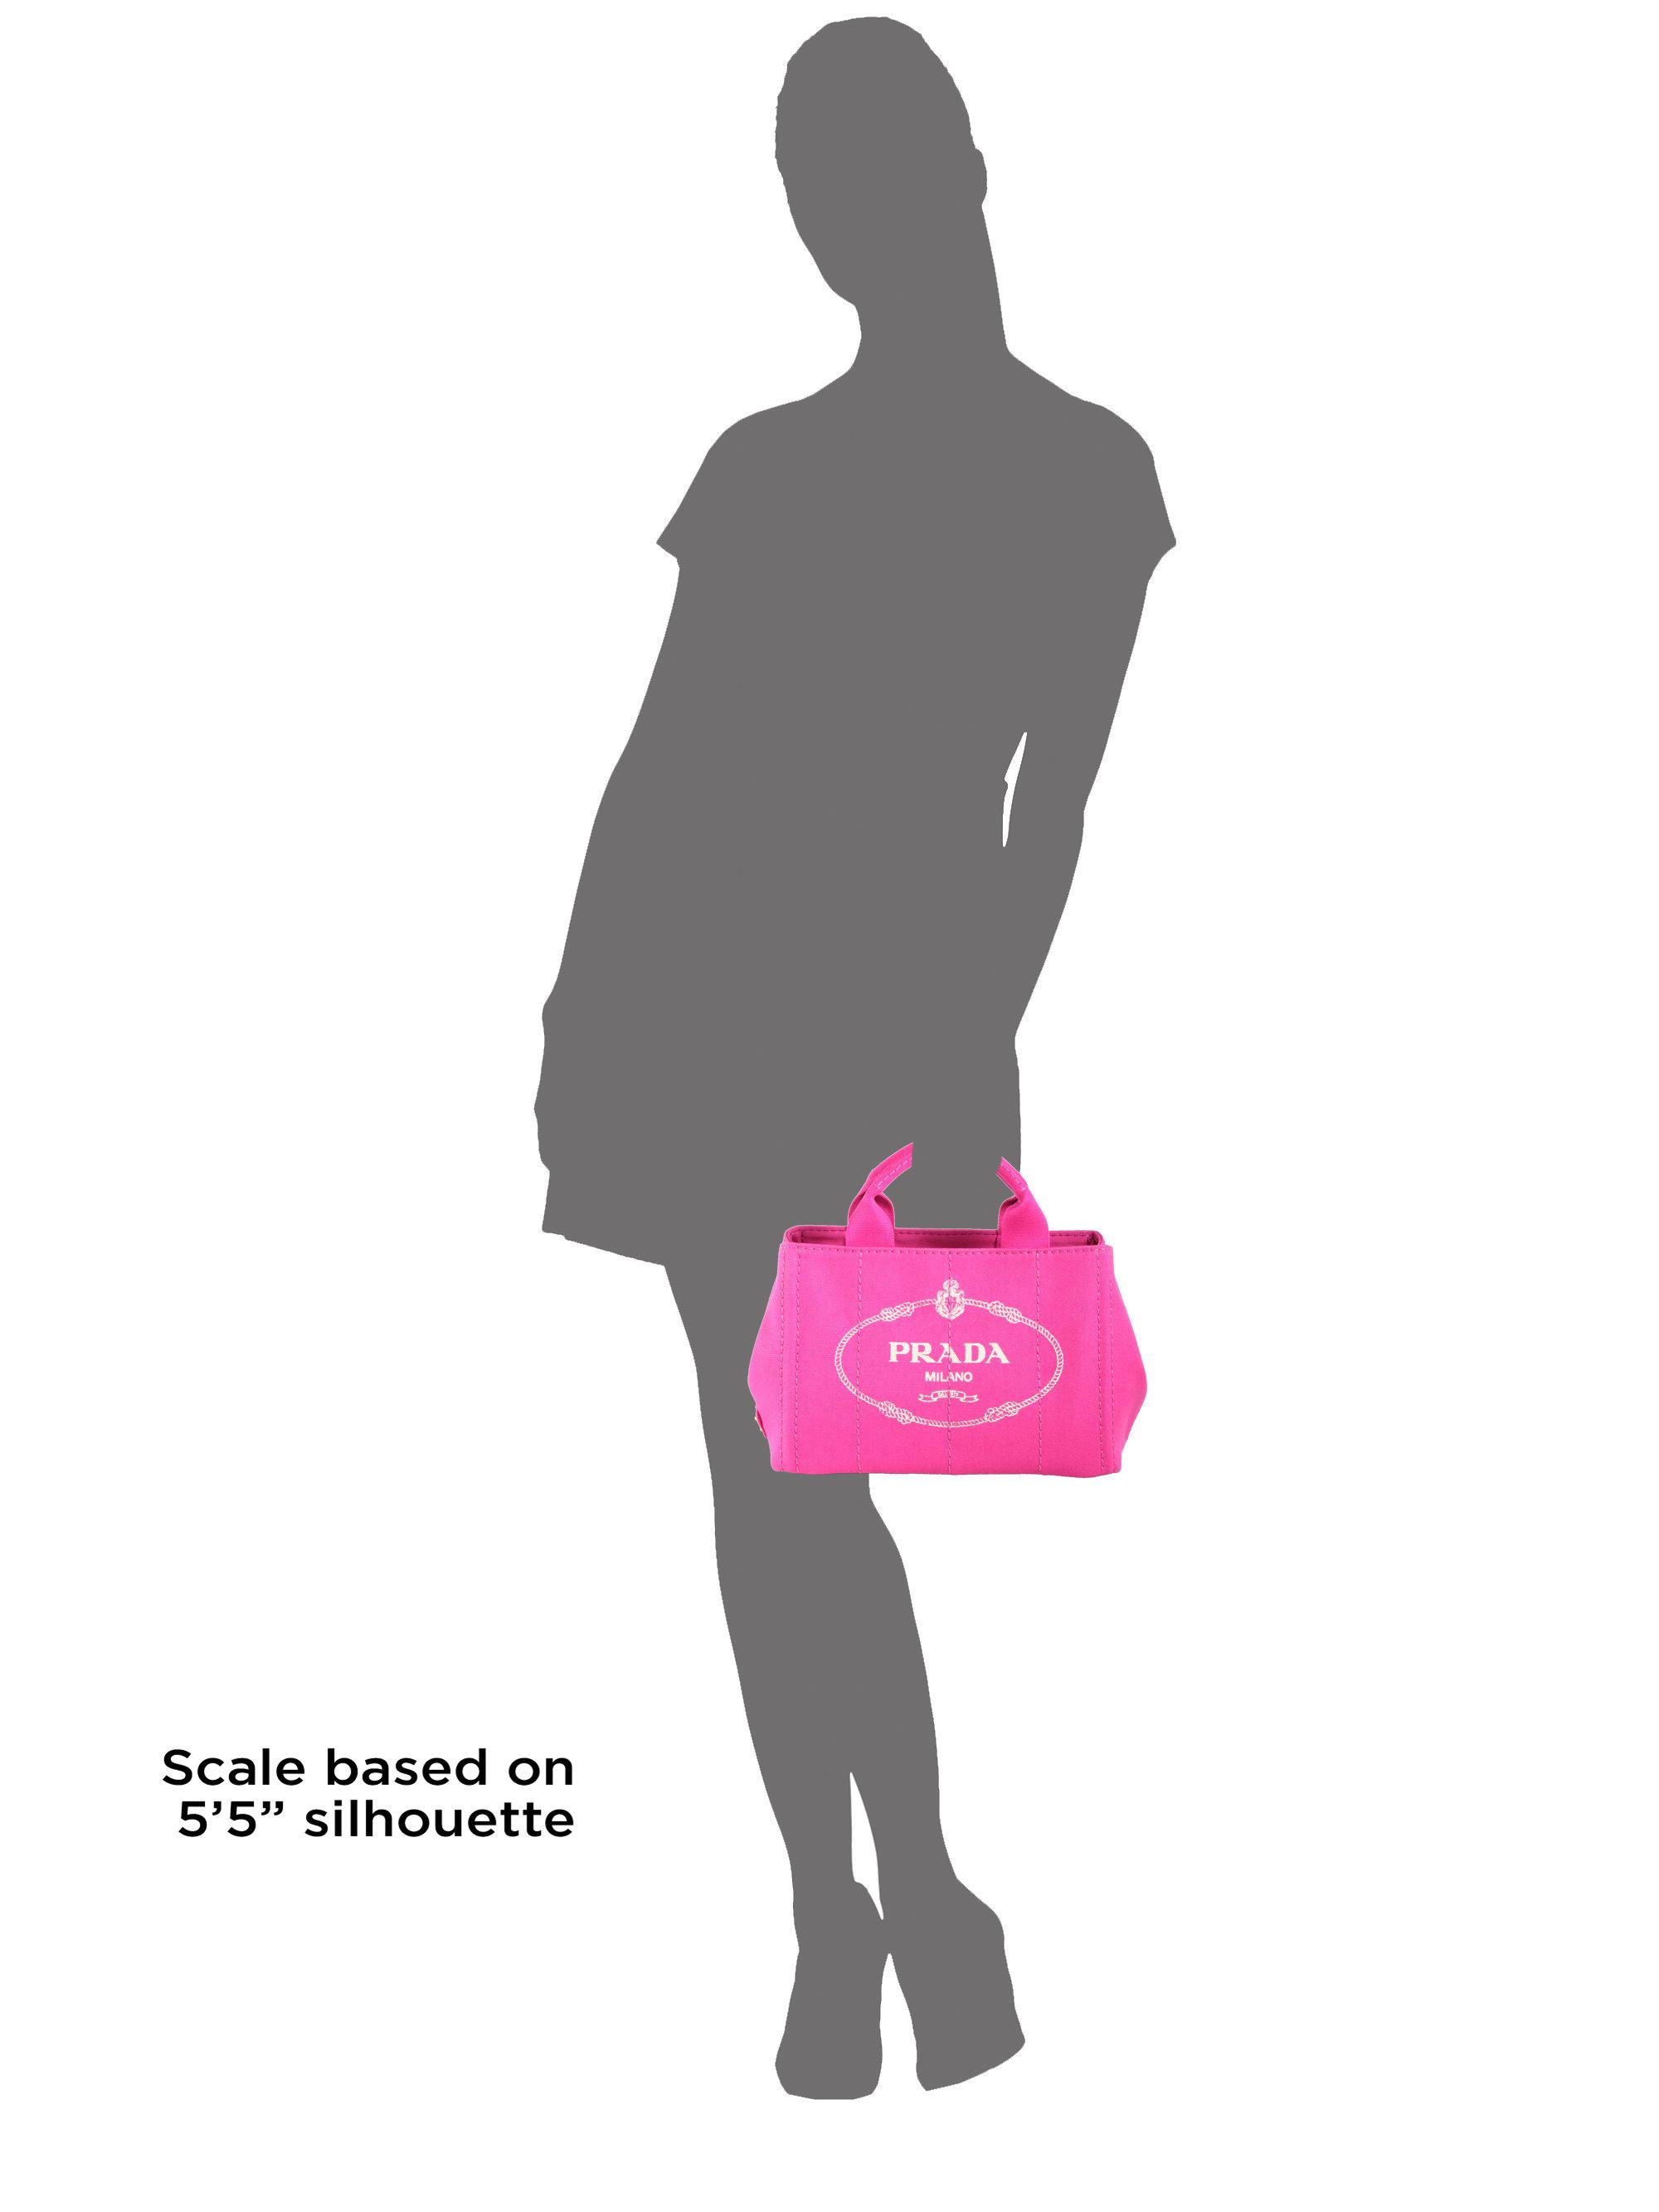 prada totes bags - Prada Logo Printed Small Canvas Tote in Pink (FUXIA-PINK) | Lyst